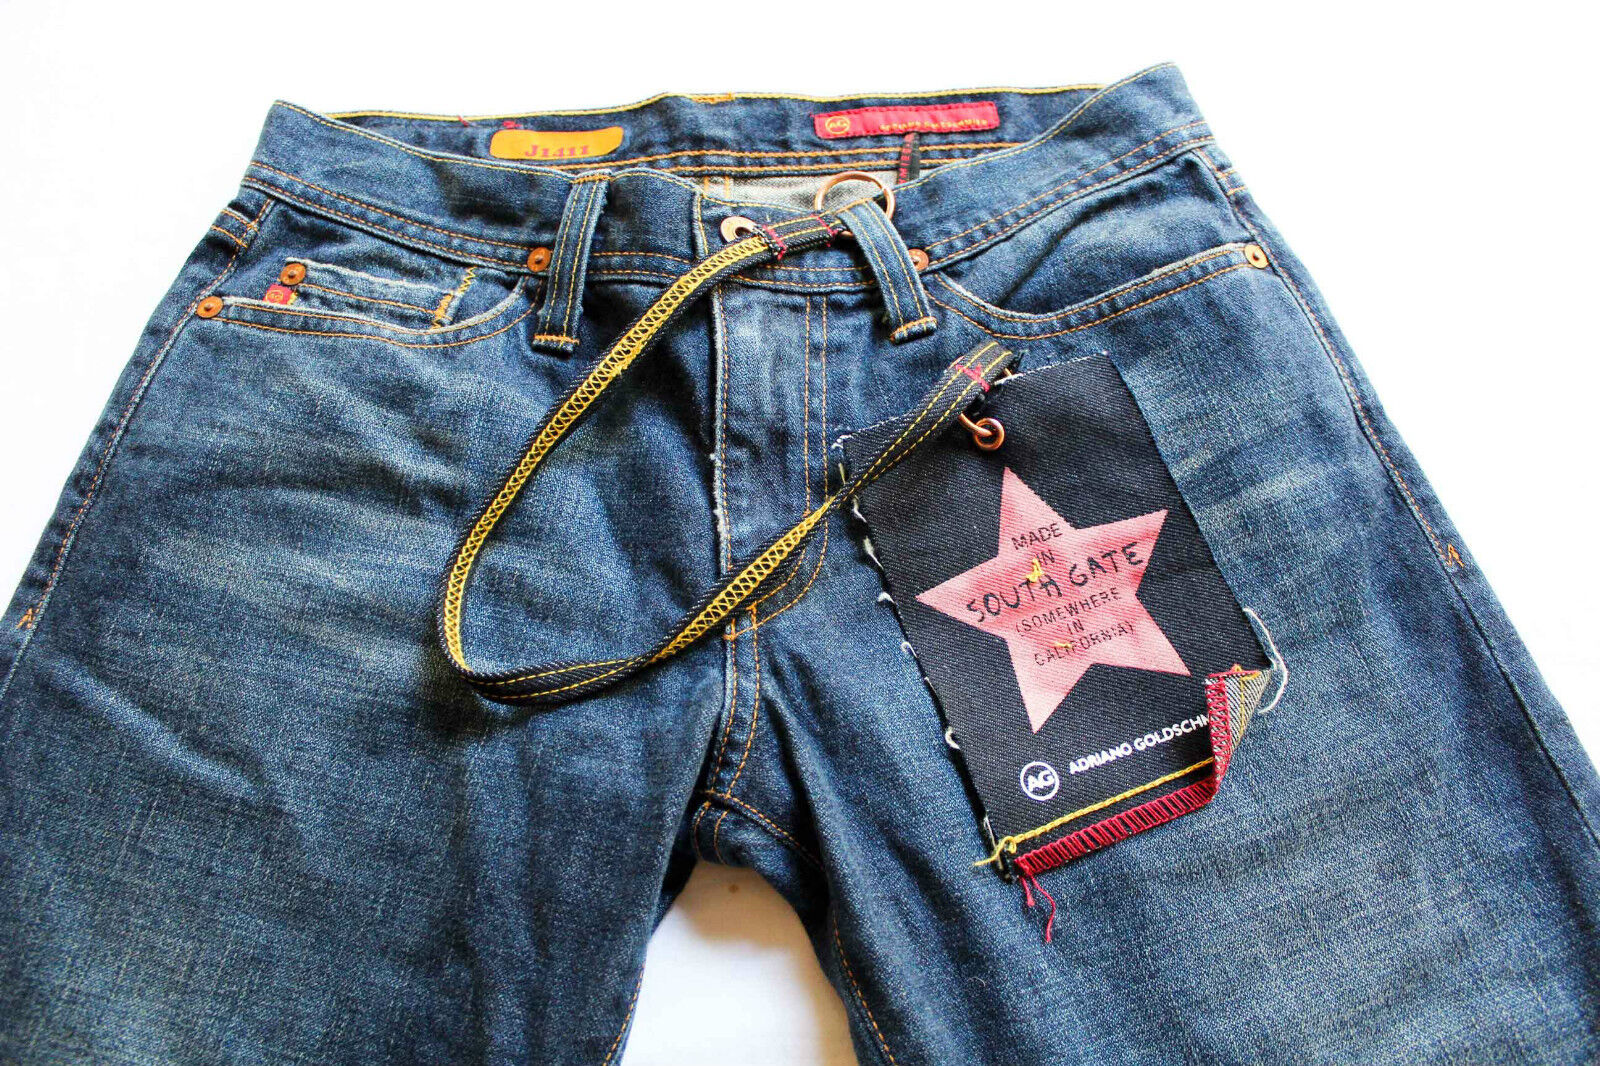 AG Adriano Goldschmied USA Femme Stiefelcut Blau Denim Jeans Neuf Avec Étiquettes 28R 28x33  158